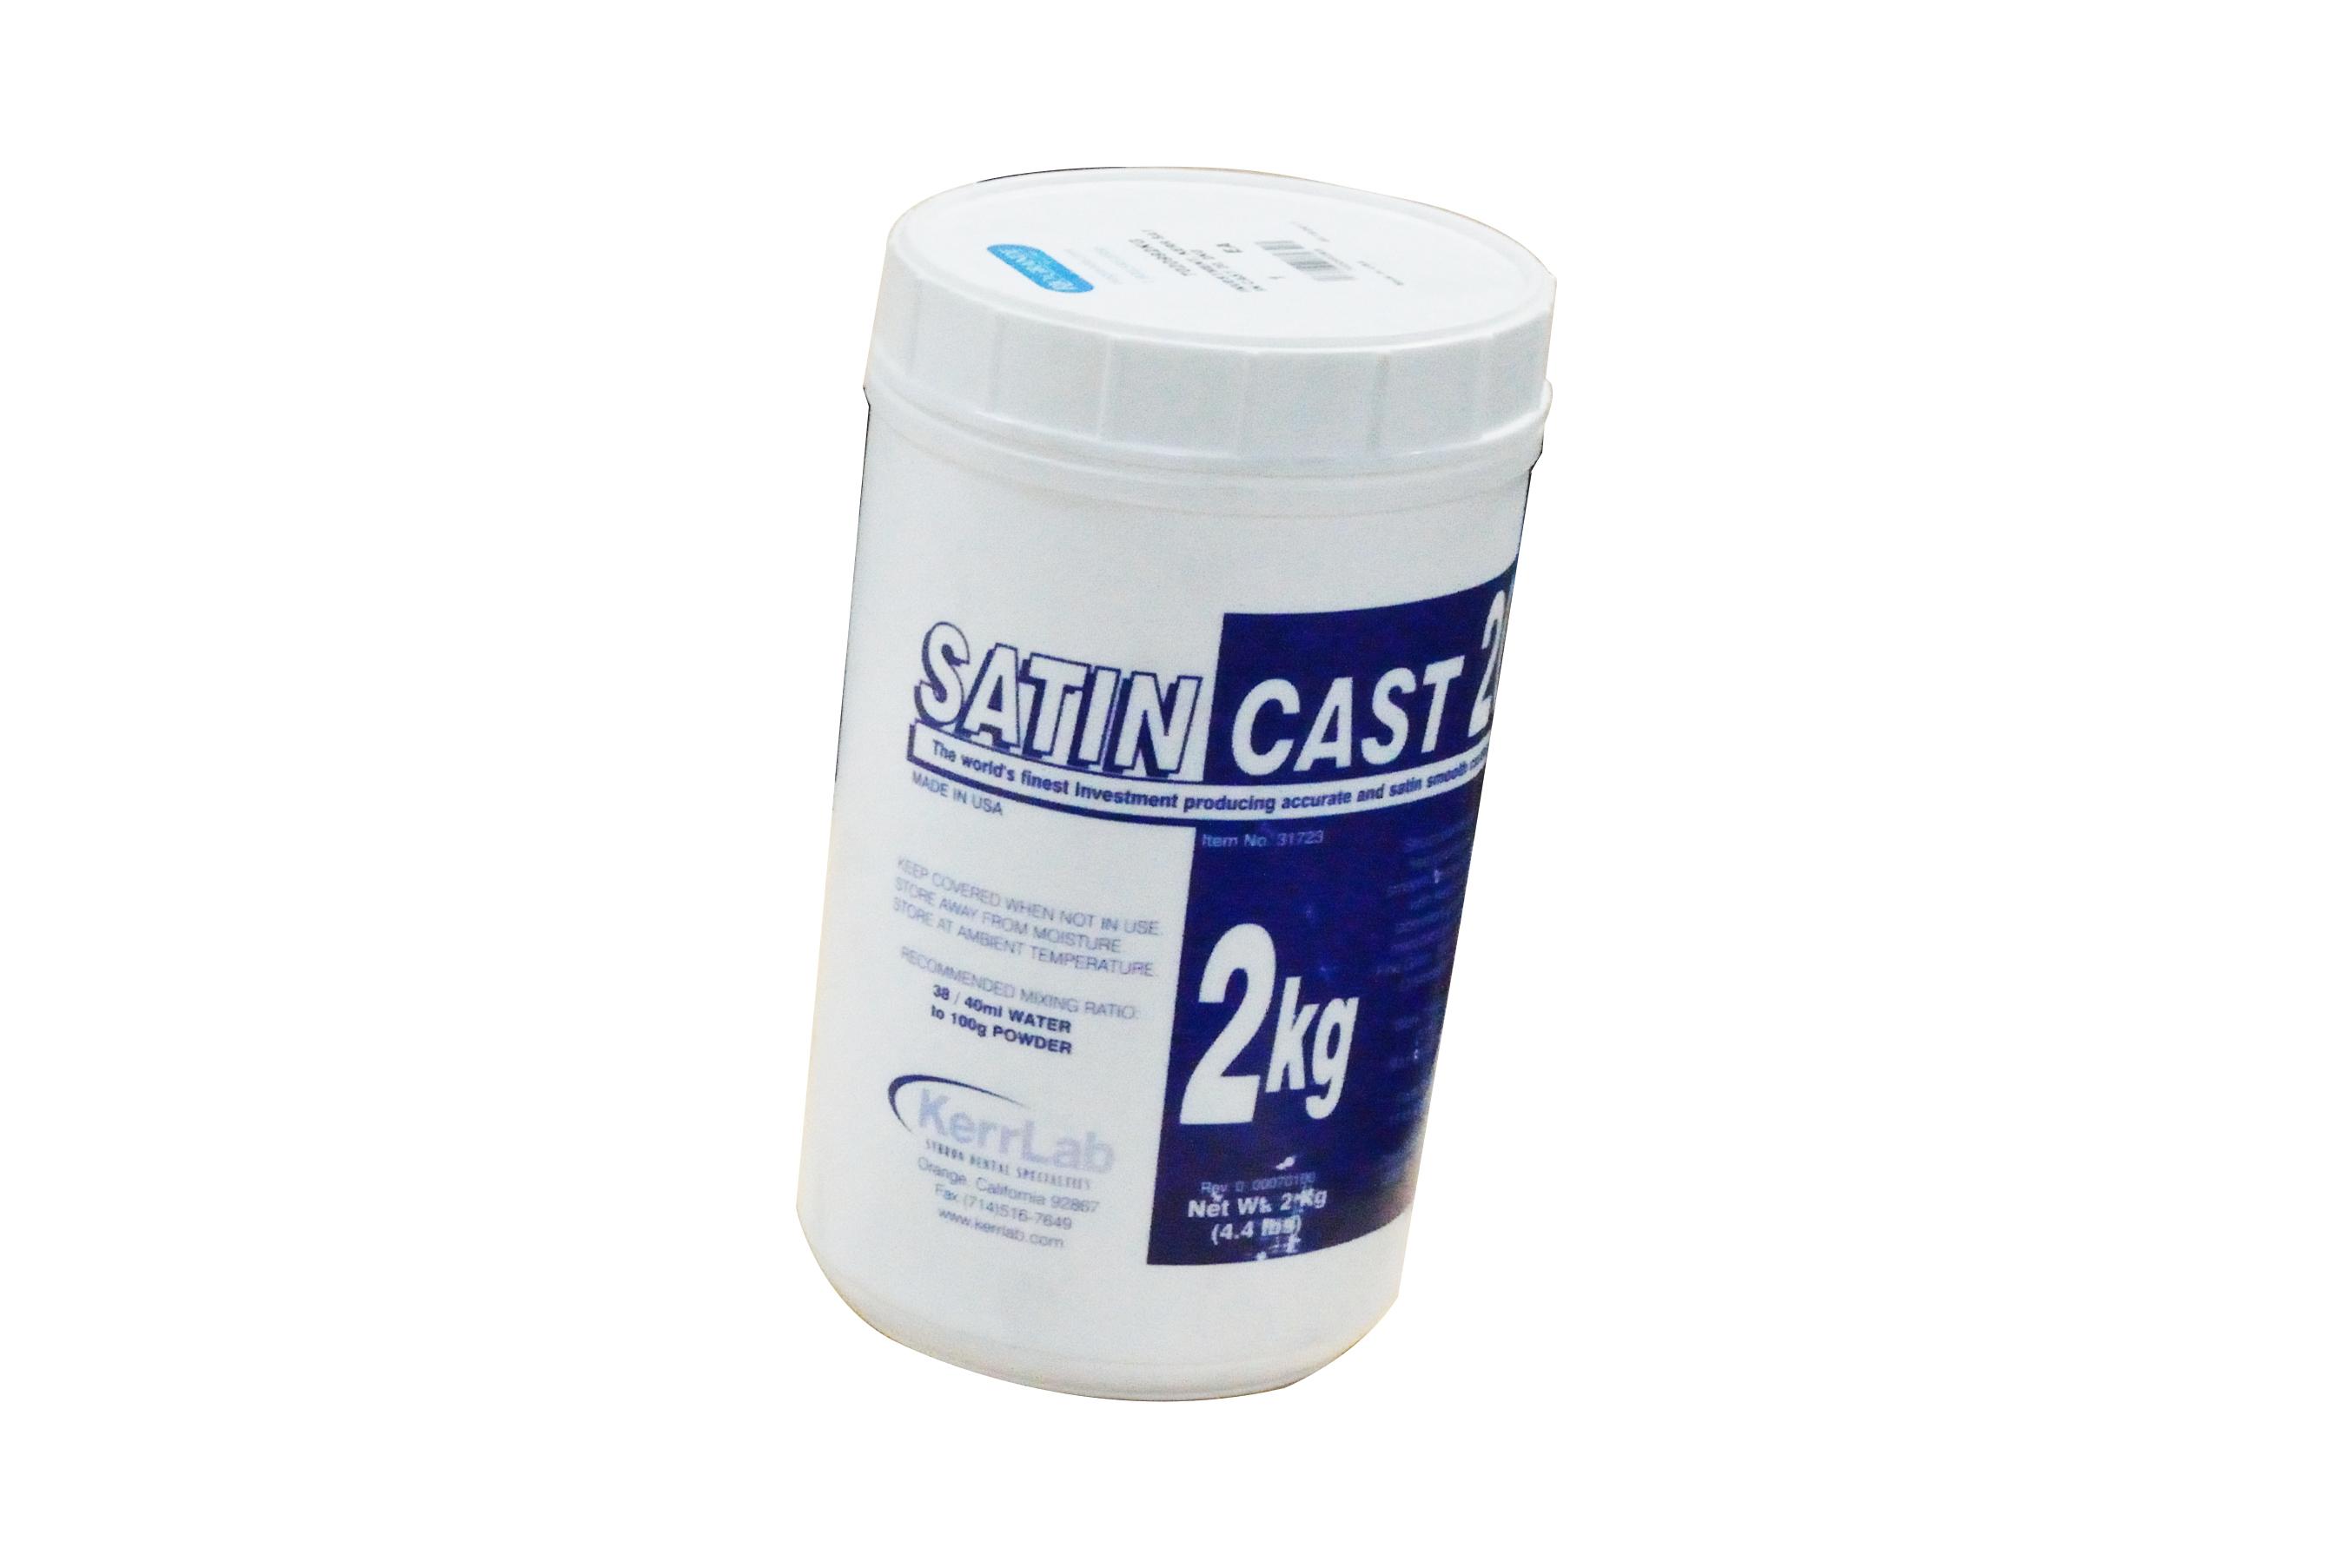 1200 186 C Vacuum Melting Casting System Eq Vmcs 1200